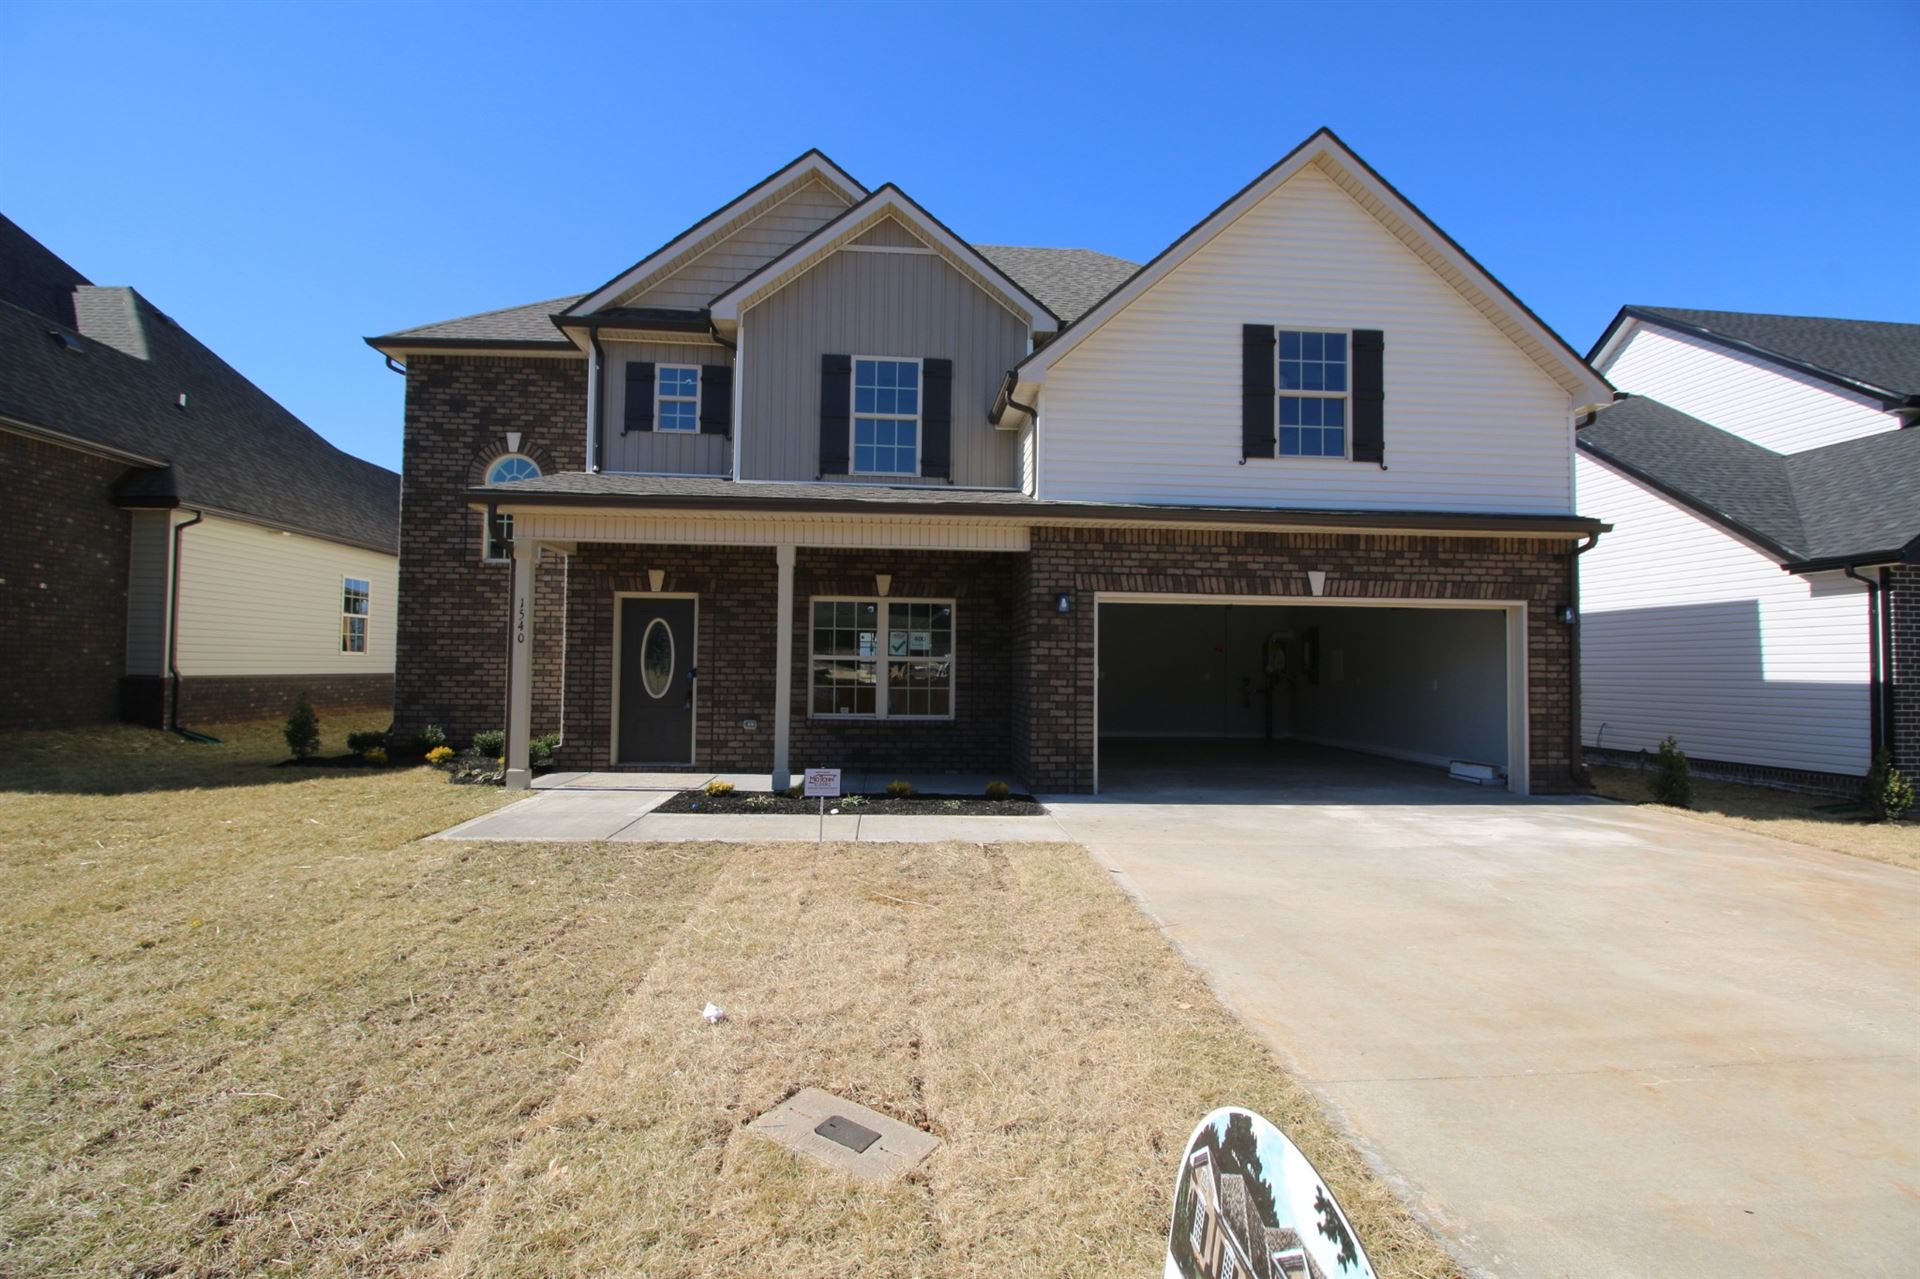 400 Summerfield, Clarksville, TN 37040 - MLS#: 2303079